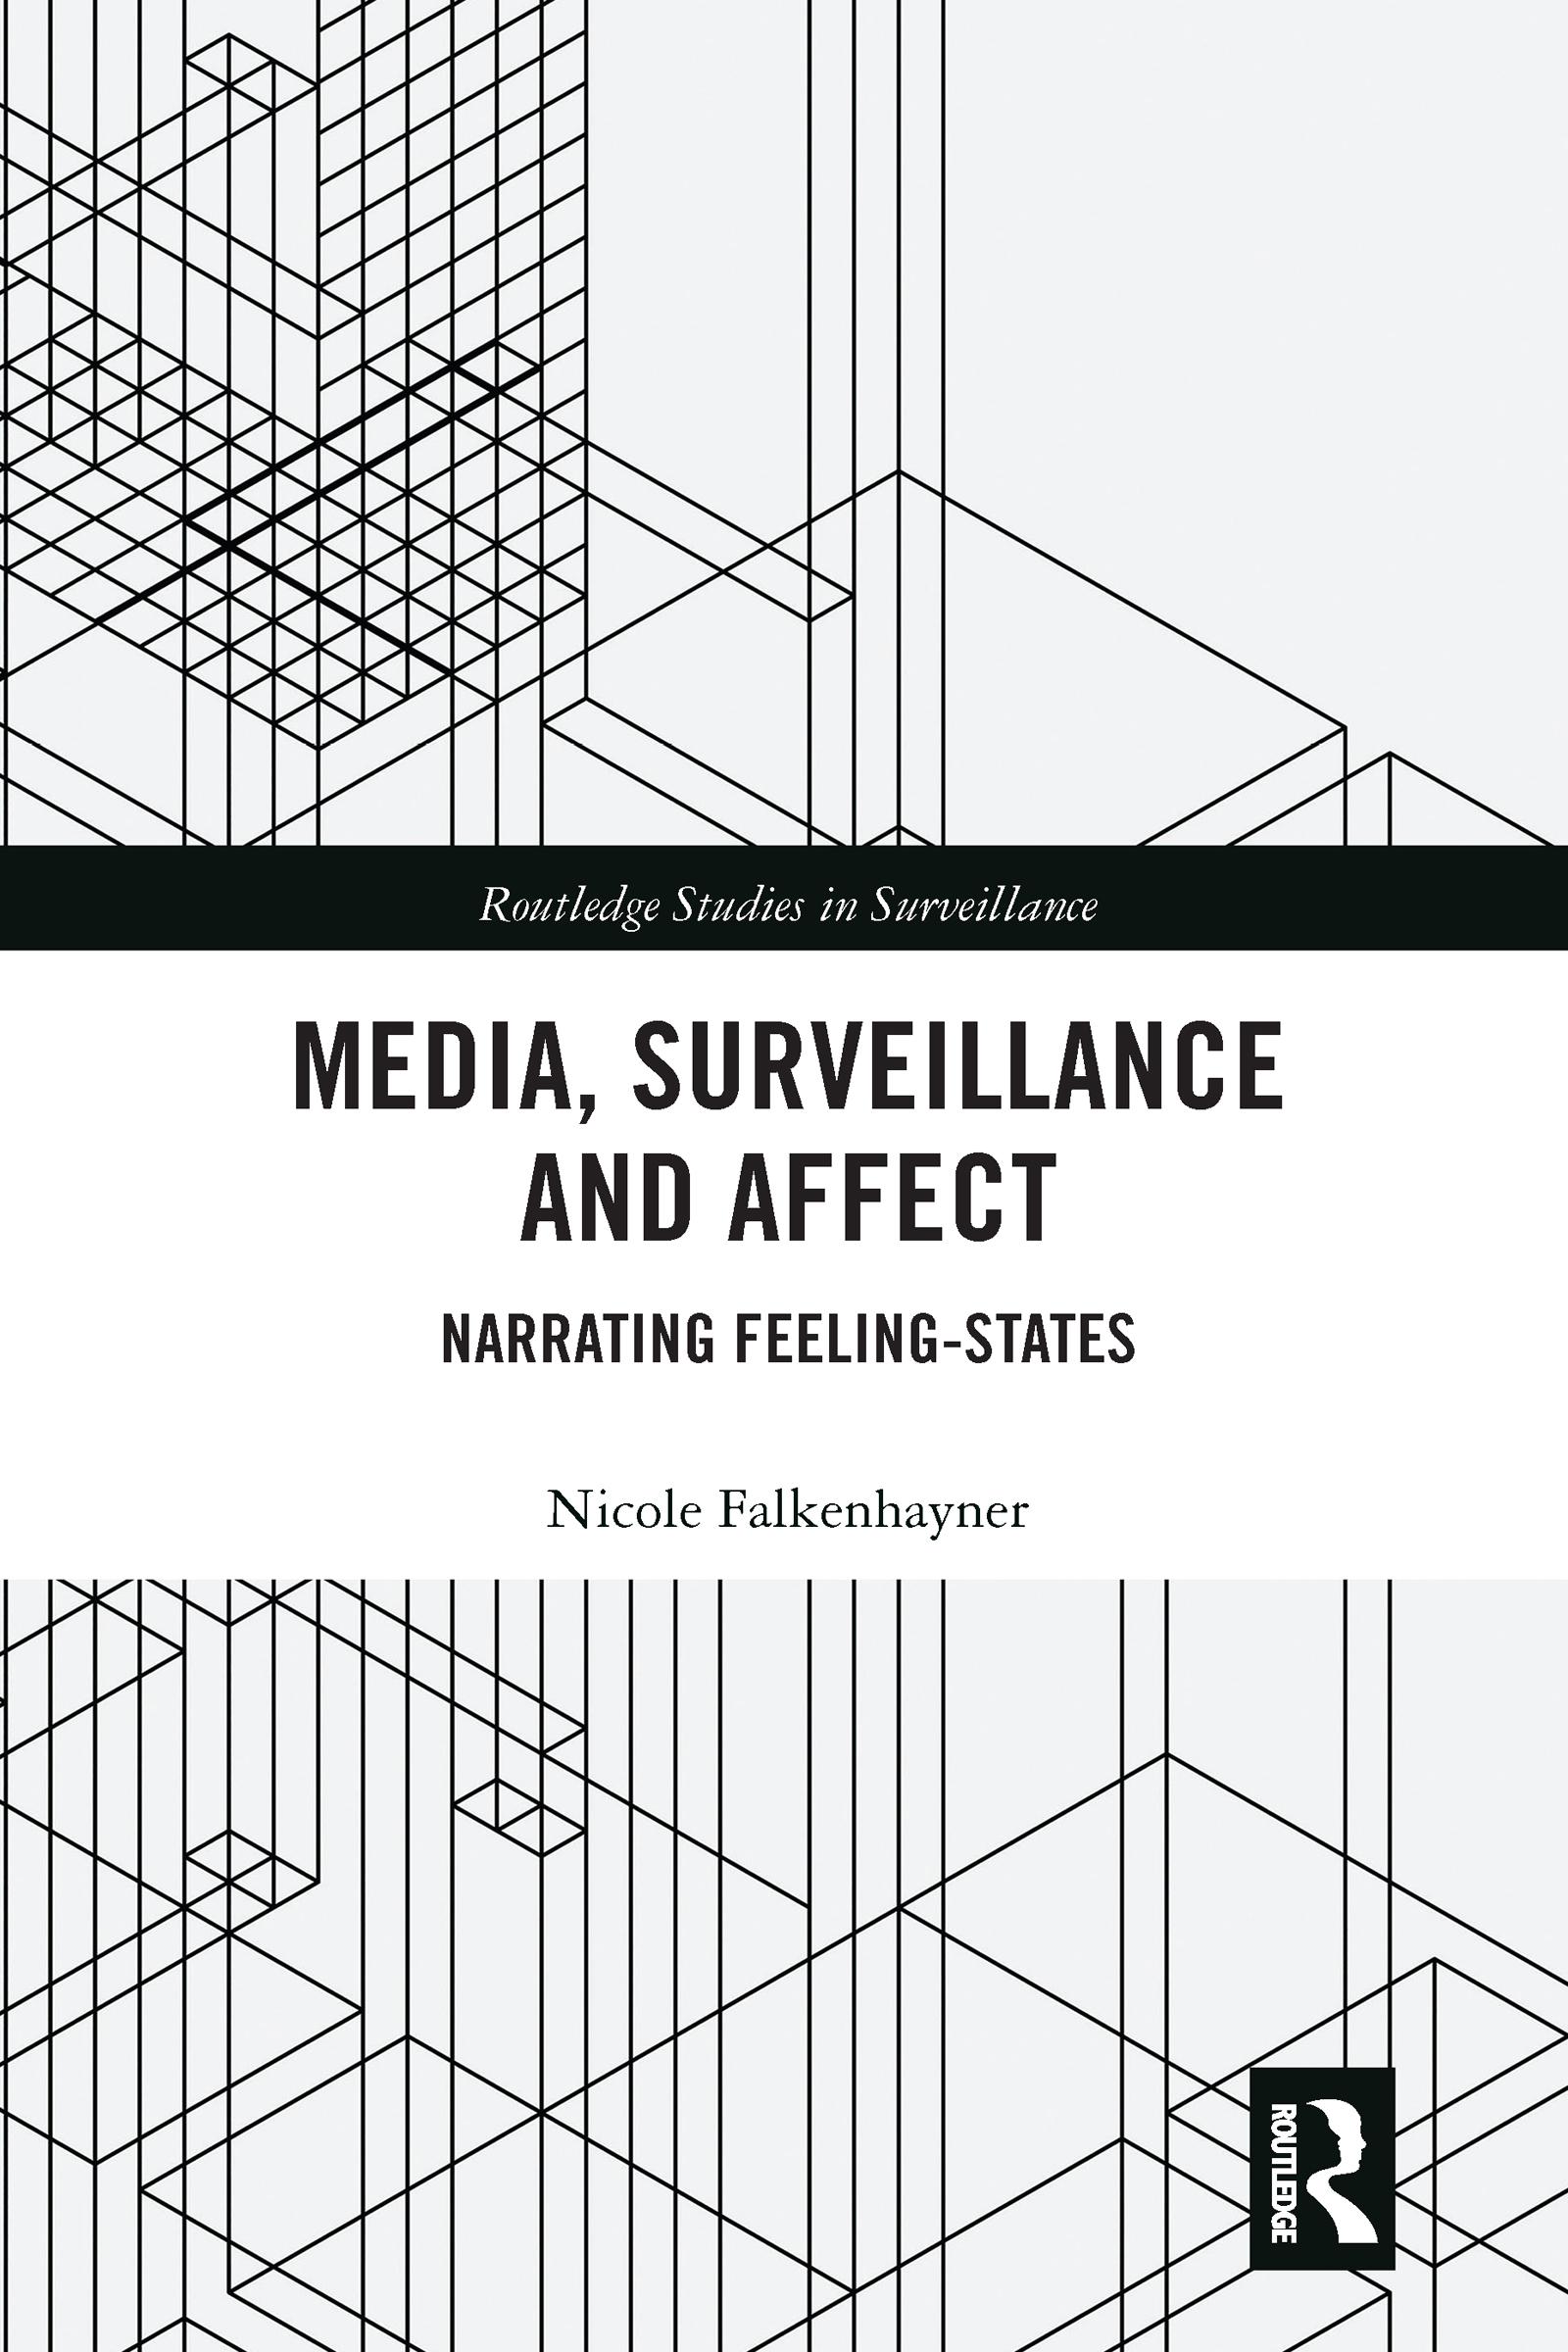 Media, Surveillance and Affect